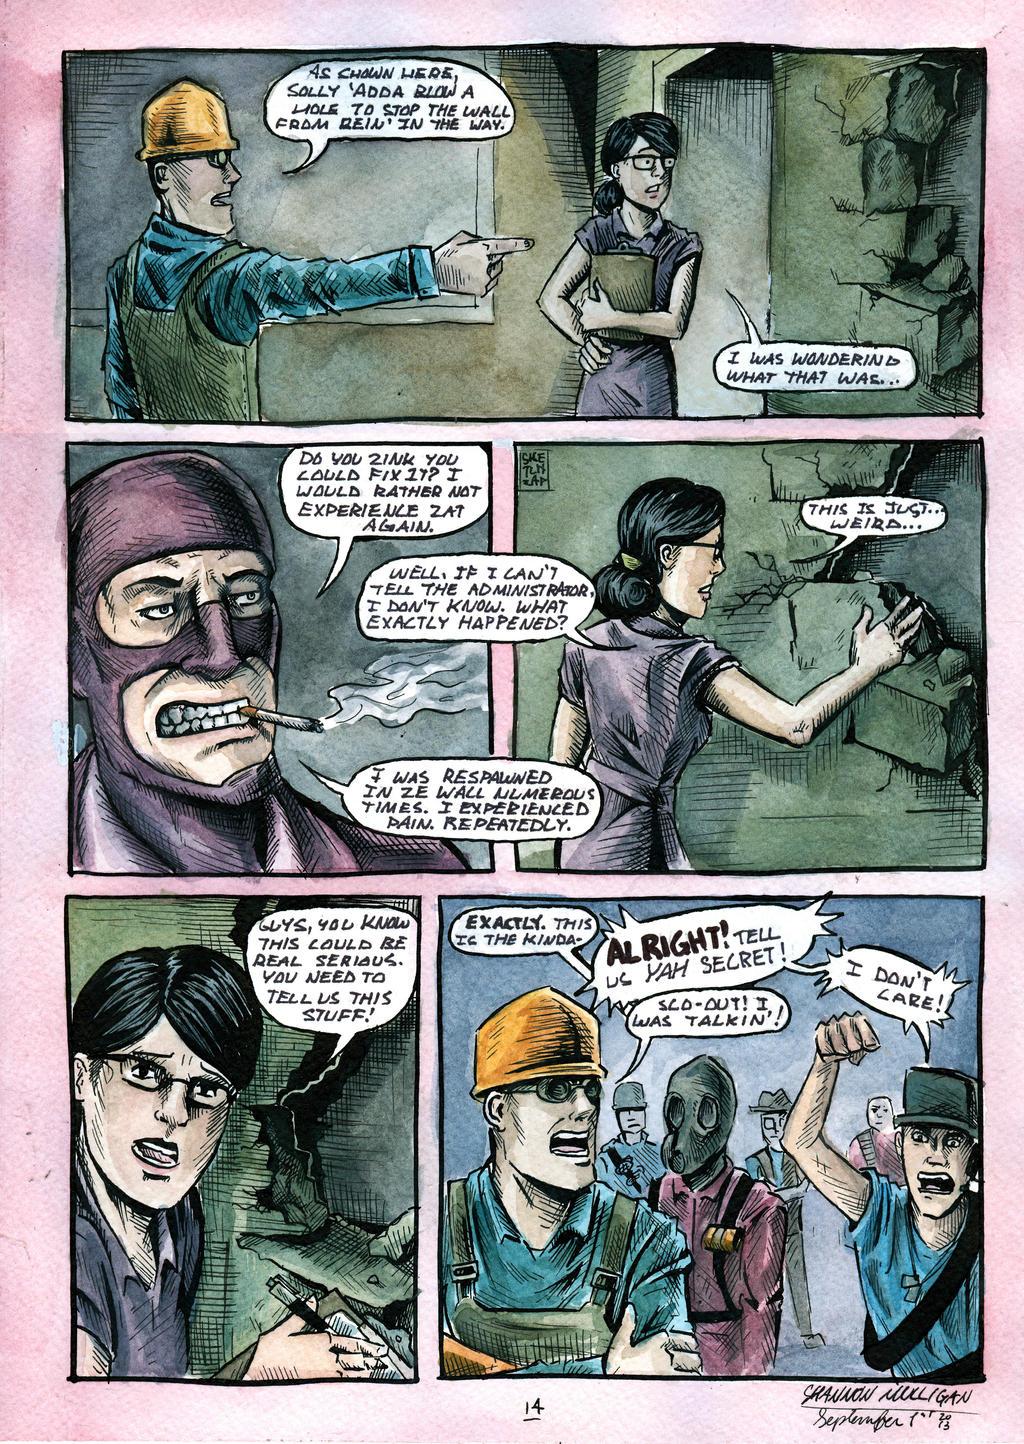 1953- pg. 14 by Sketch-Zap